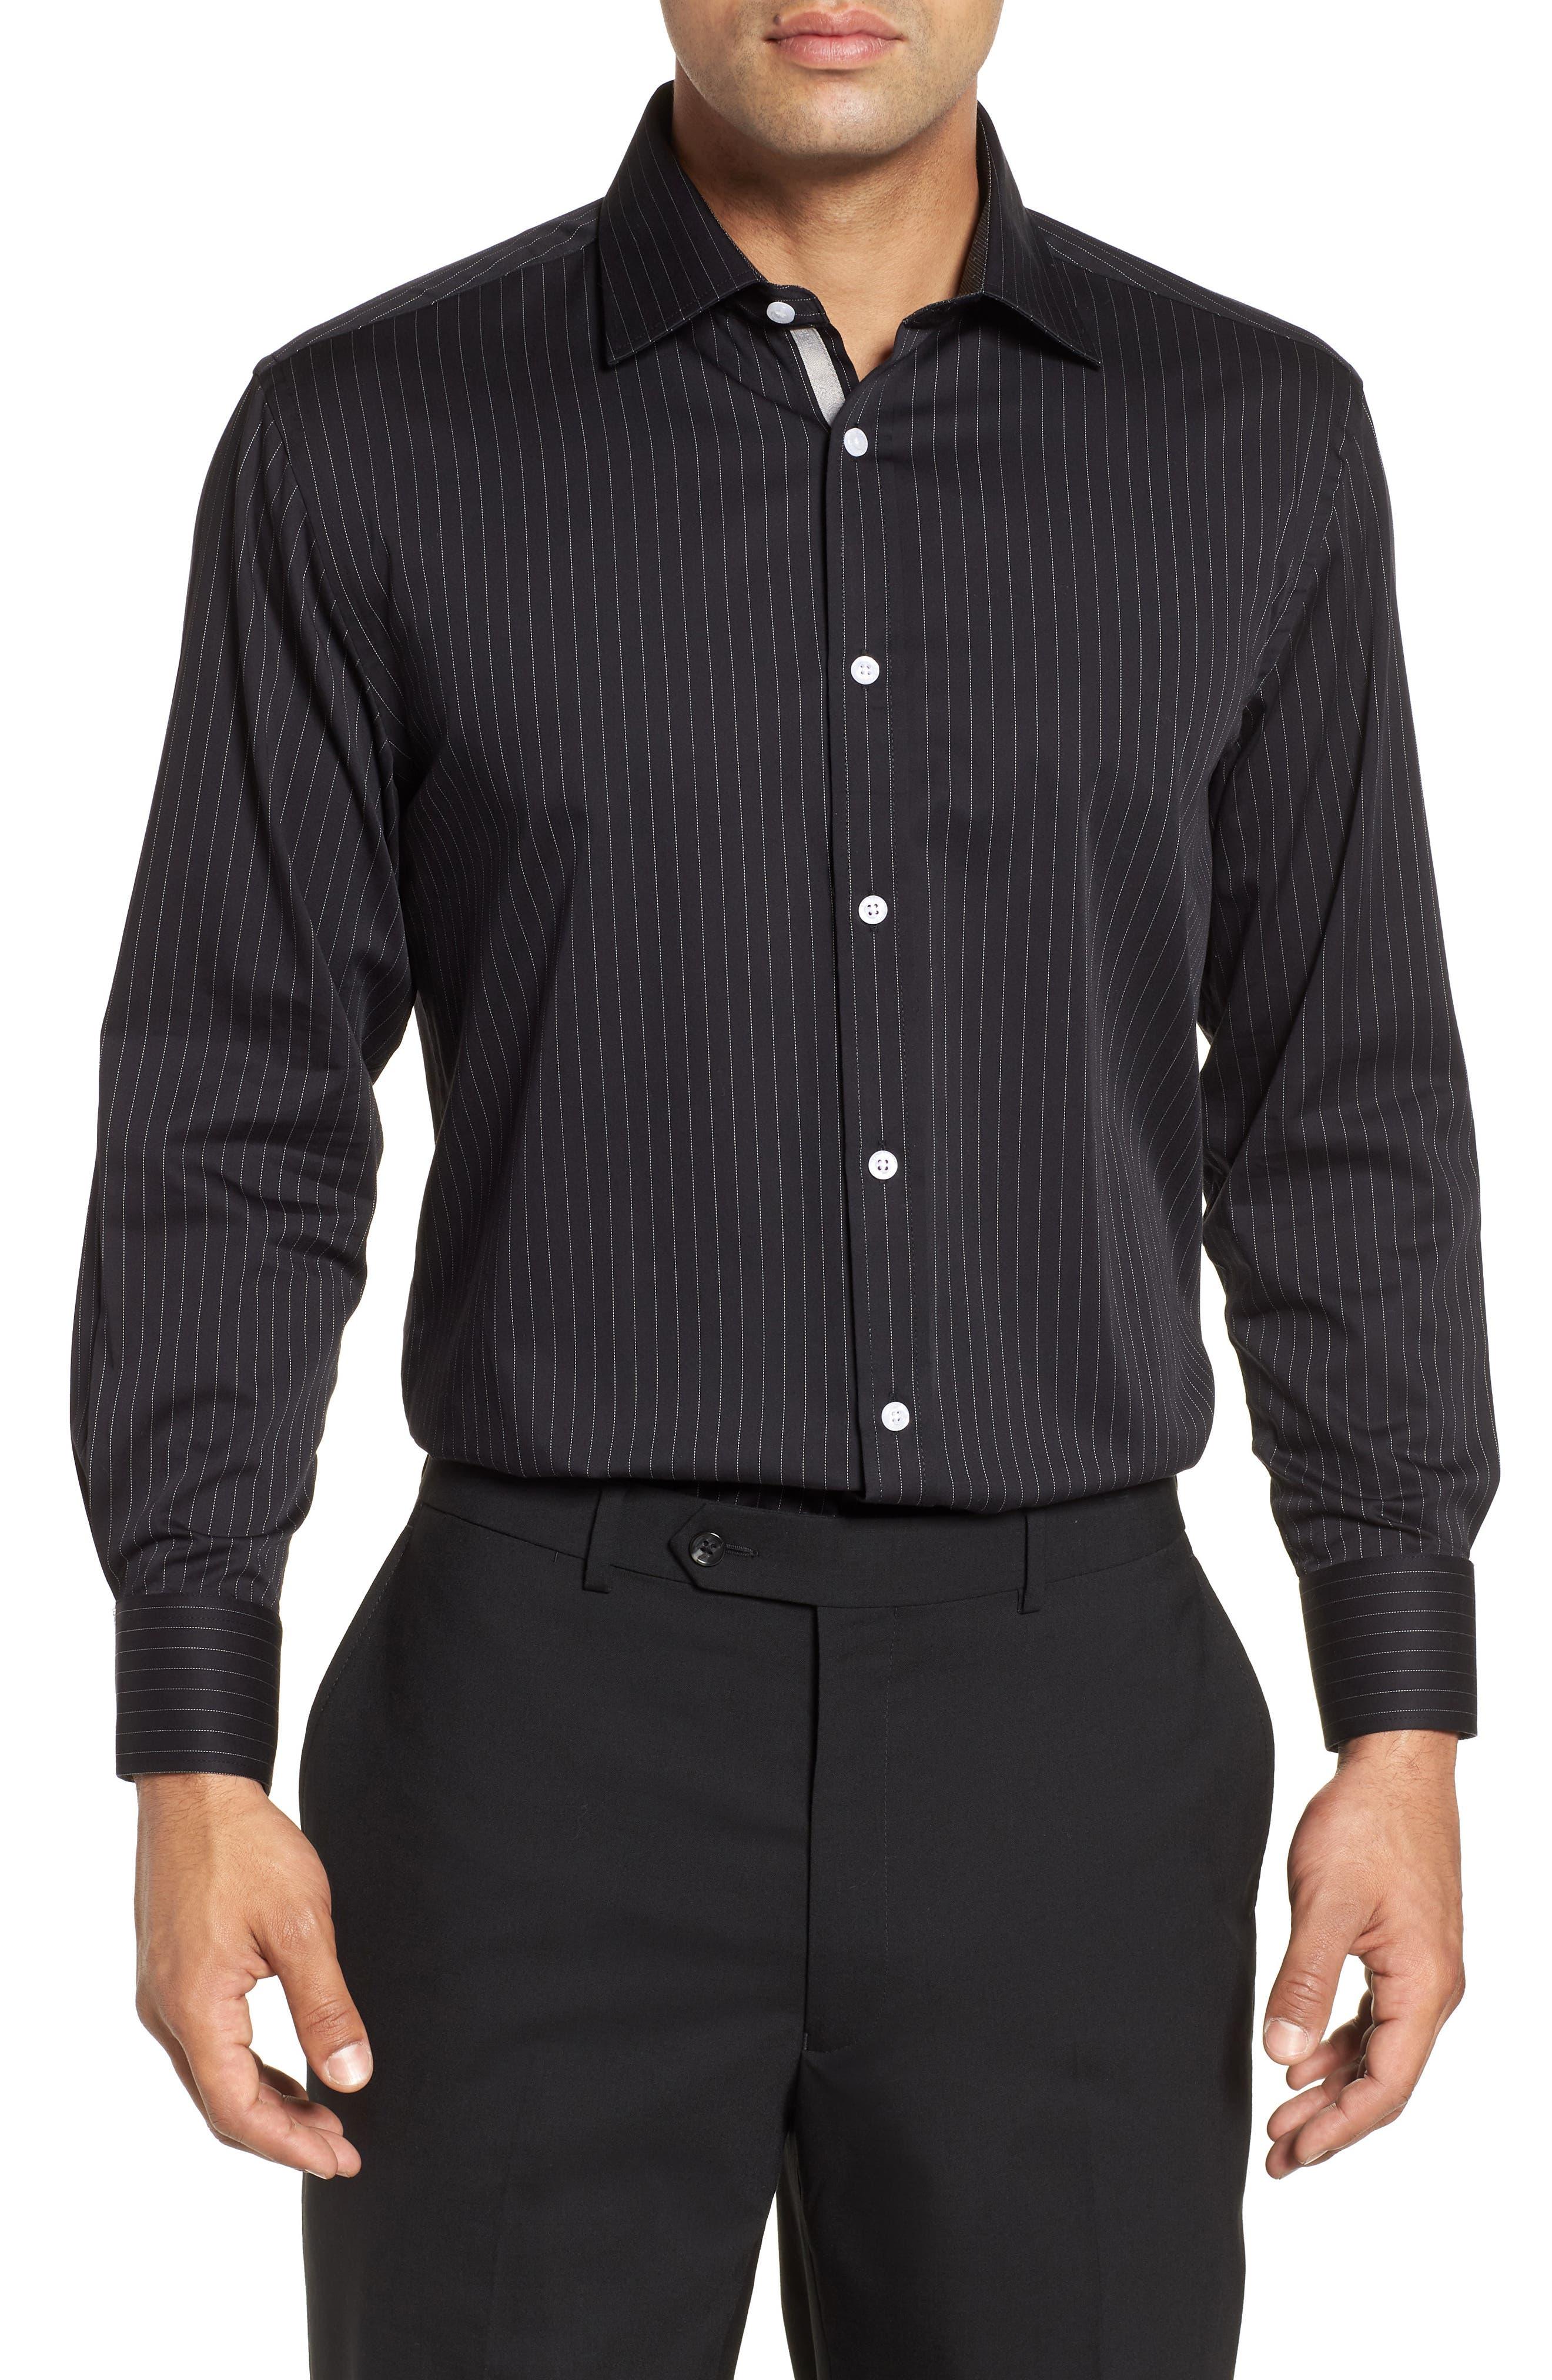 ENGLISH LAUNDRY REGULAR FIT STRETCH STRIPE DRESS SHIRT